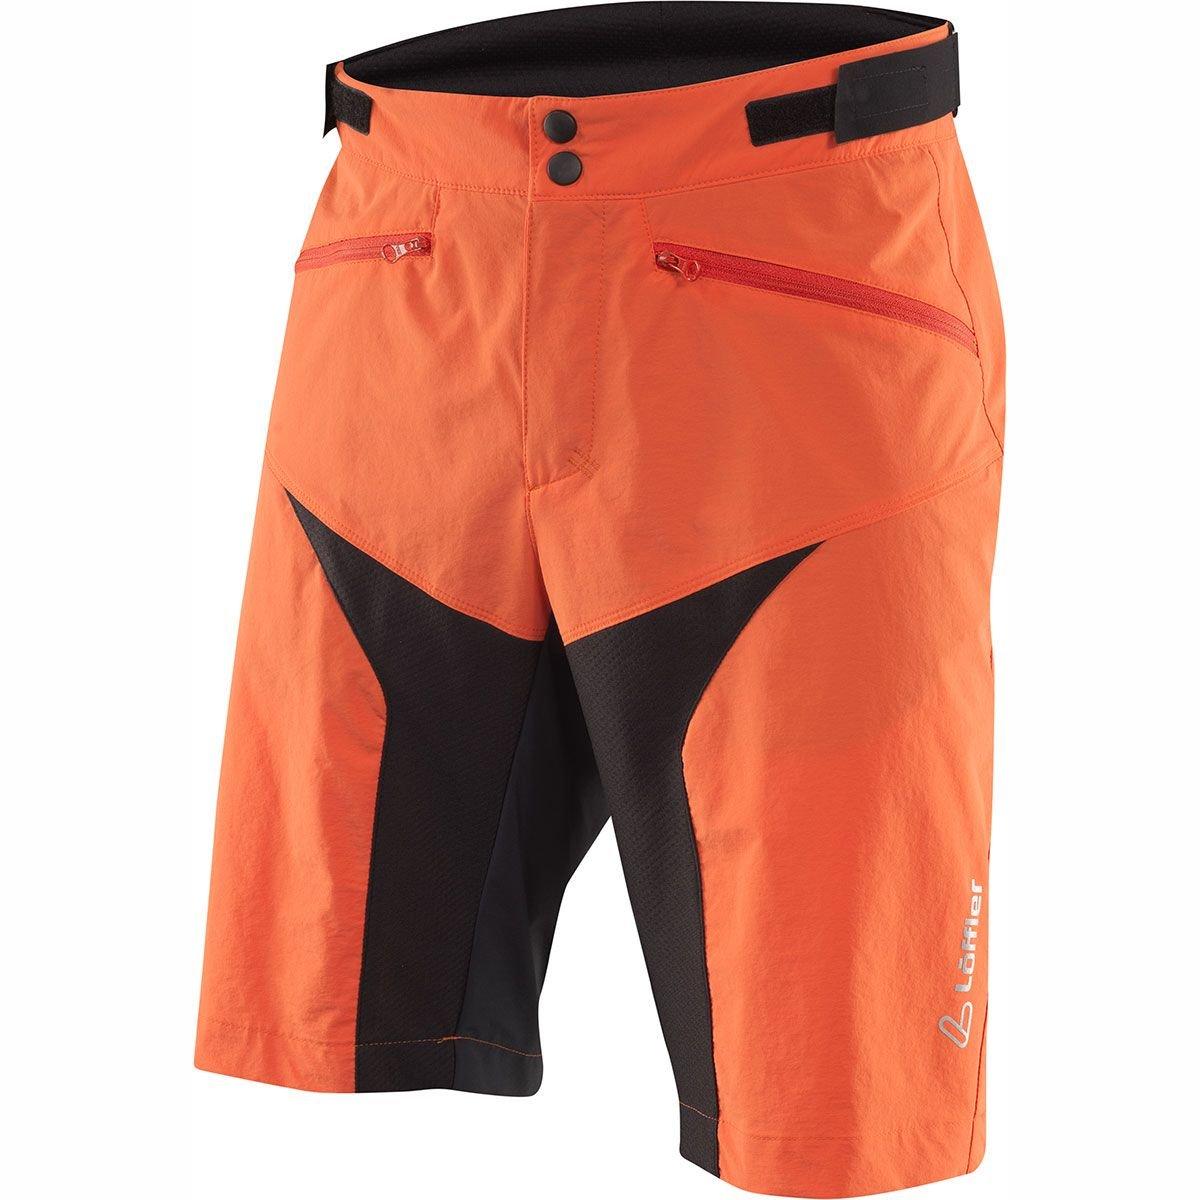 LÖFFLER He. Bike Shorts Fortano CSL